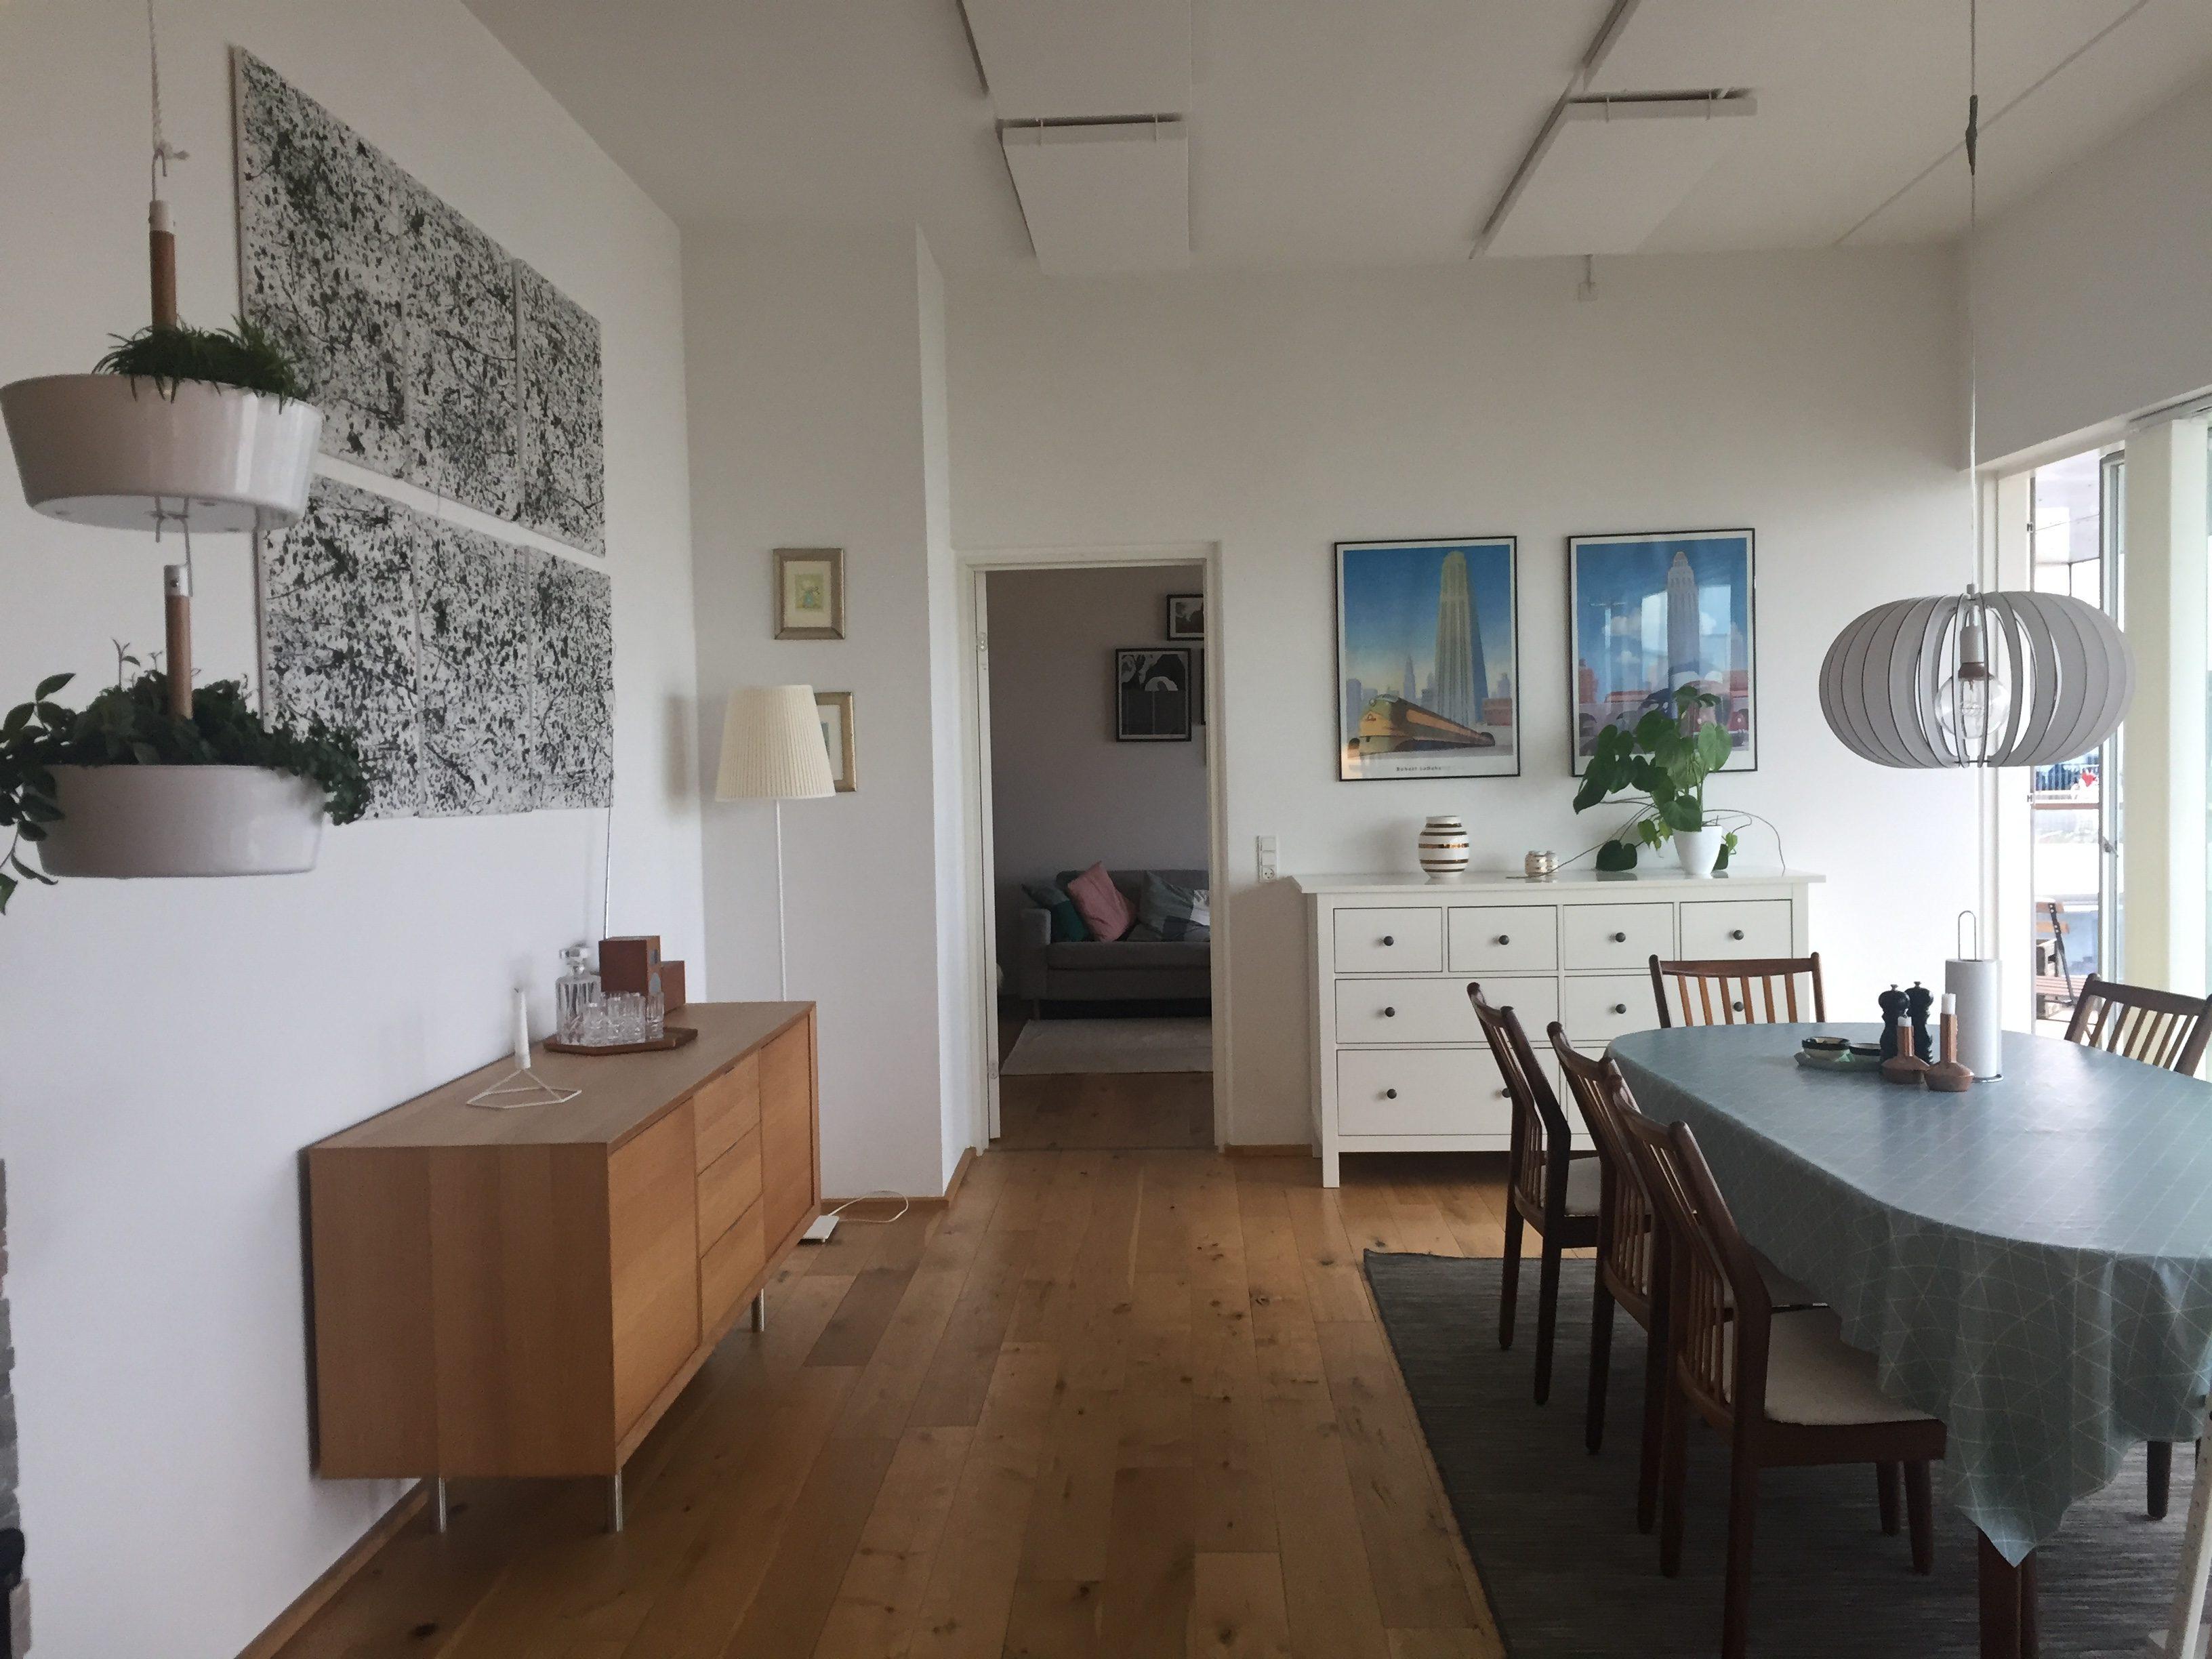 Our Copenhagen home